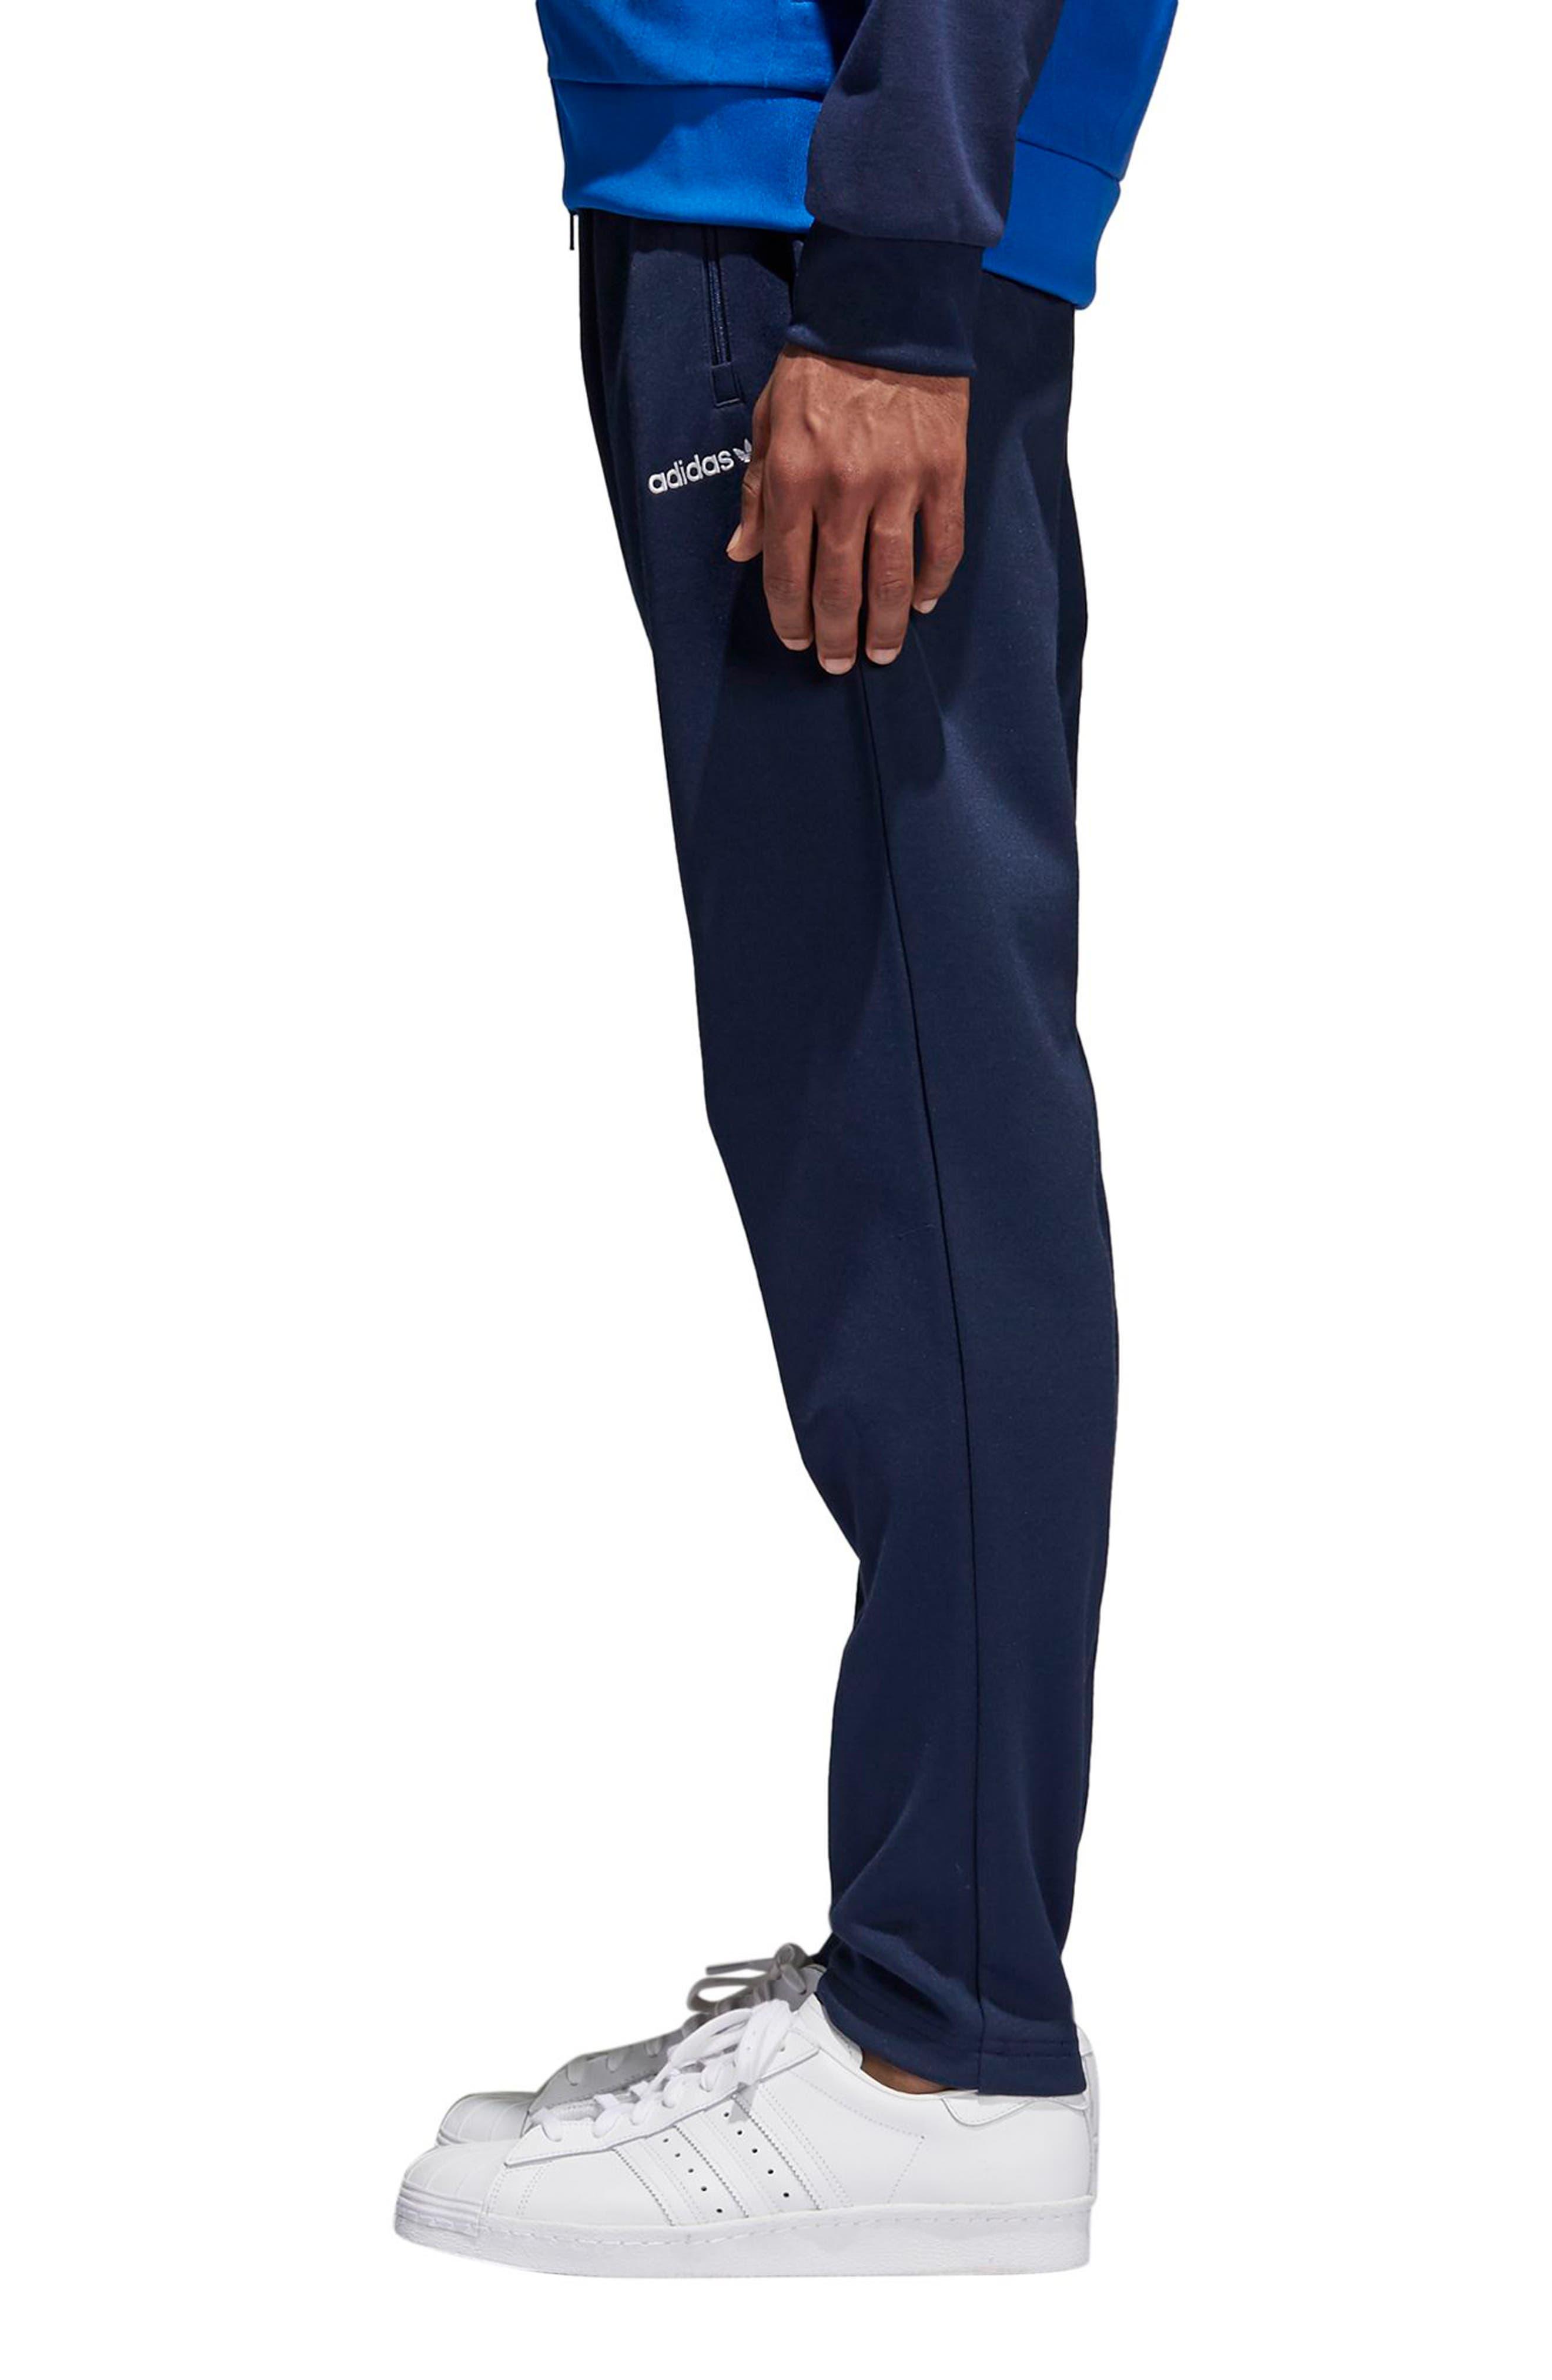 Originals Training Pants,                             Alternate thumbnail 3, color,                             Collegiate Navy